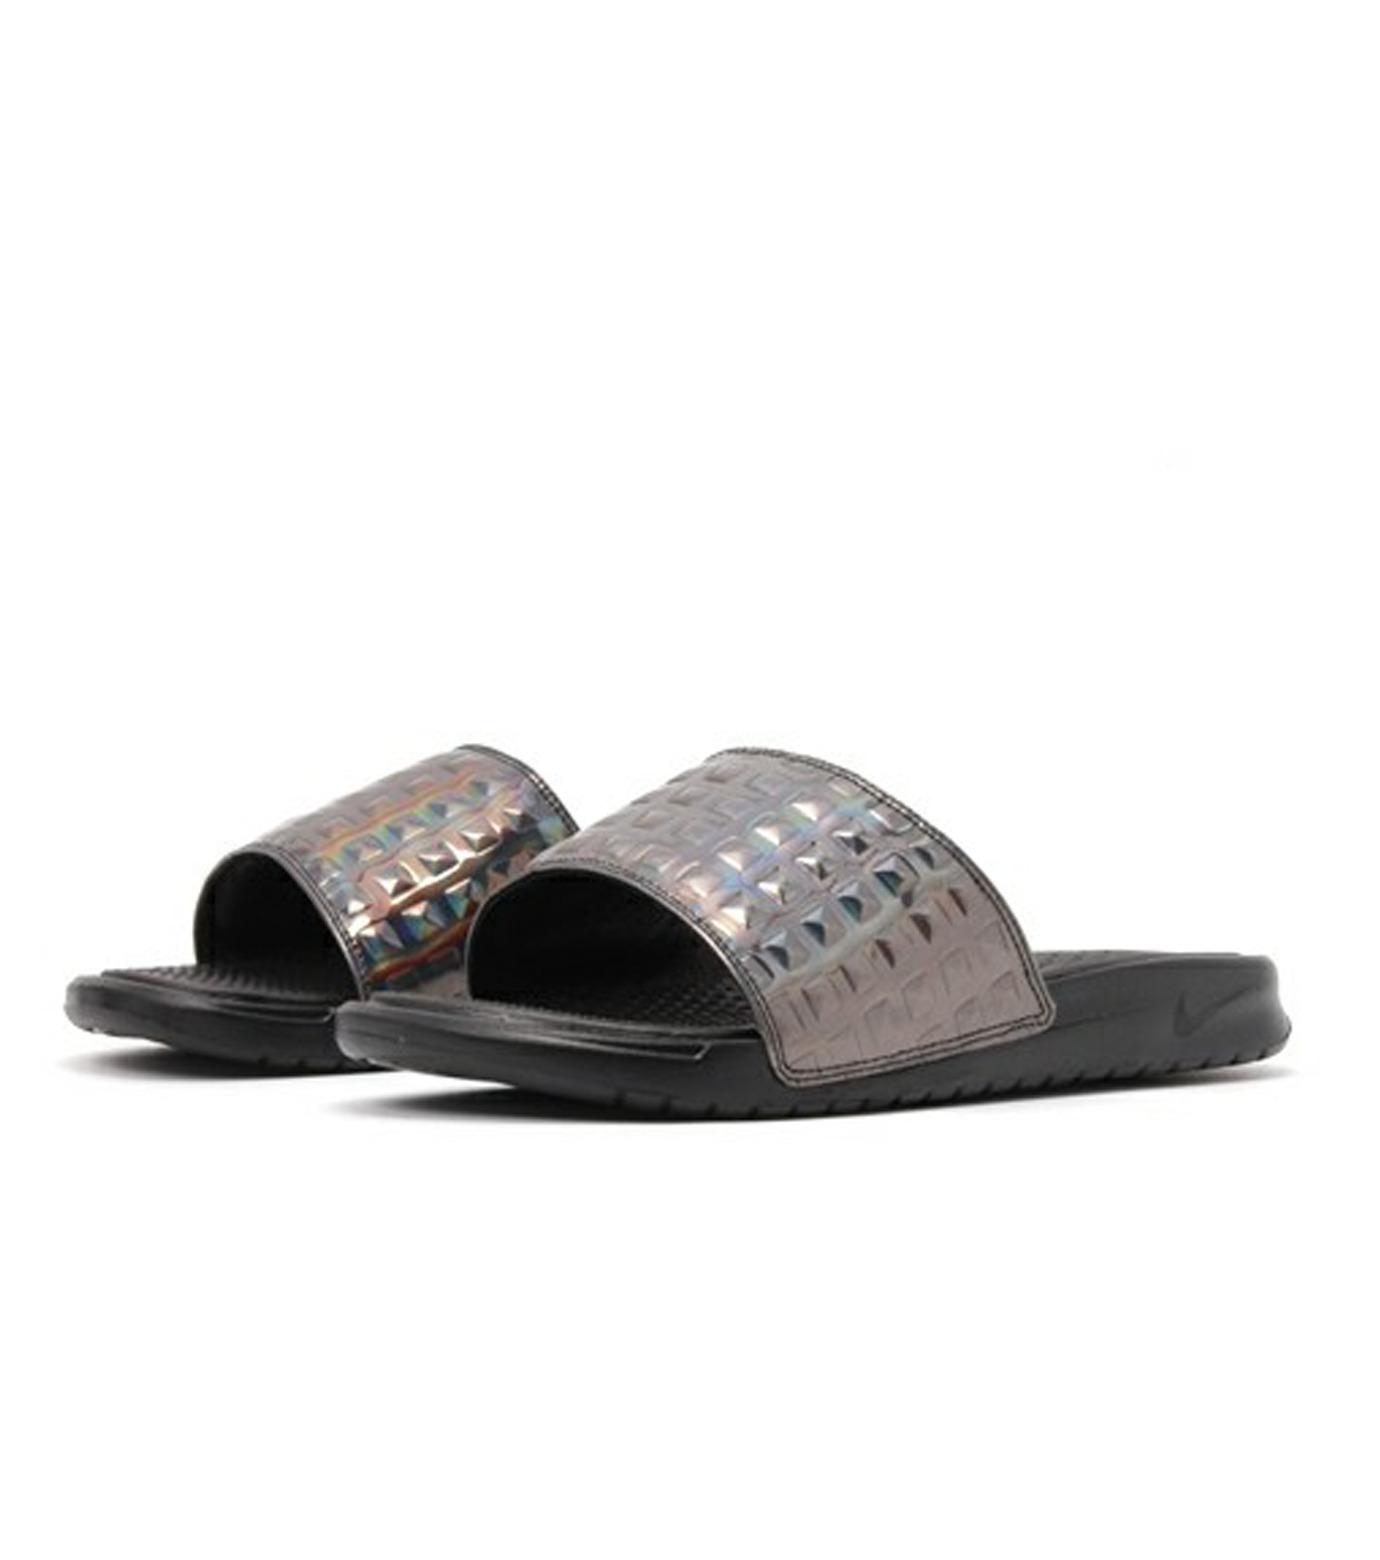 NIKE(ナイキ)のBENASSI JDI-BLACK(シューズ/shoes)-818737-003-13 拡大詳細画像3